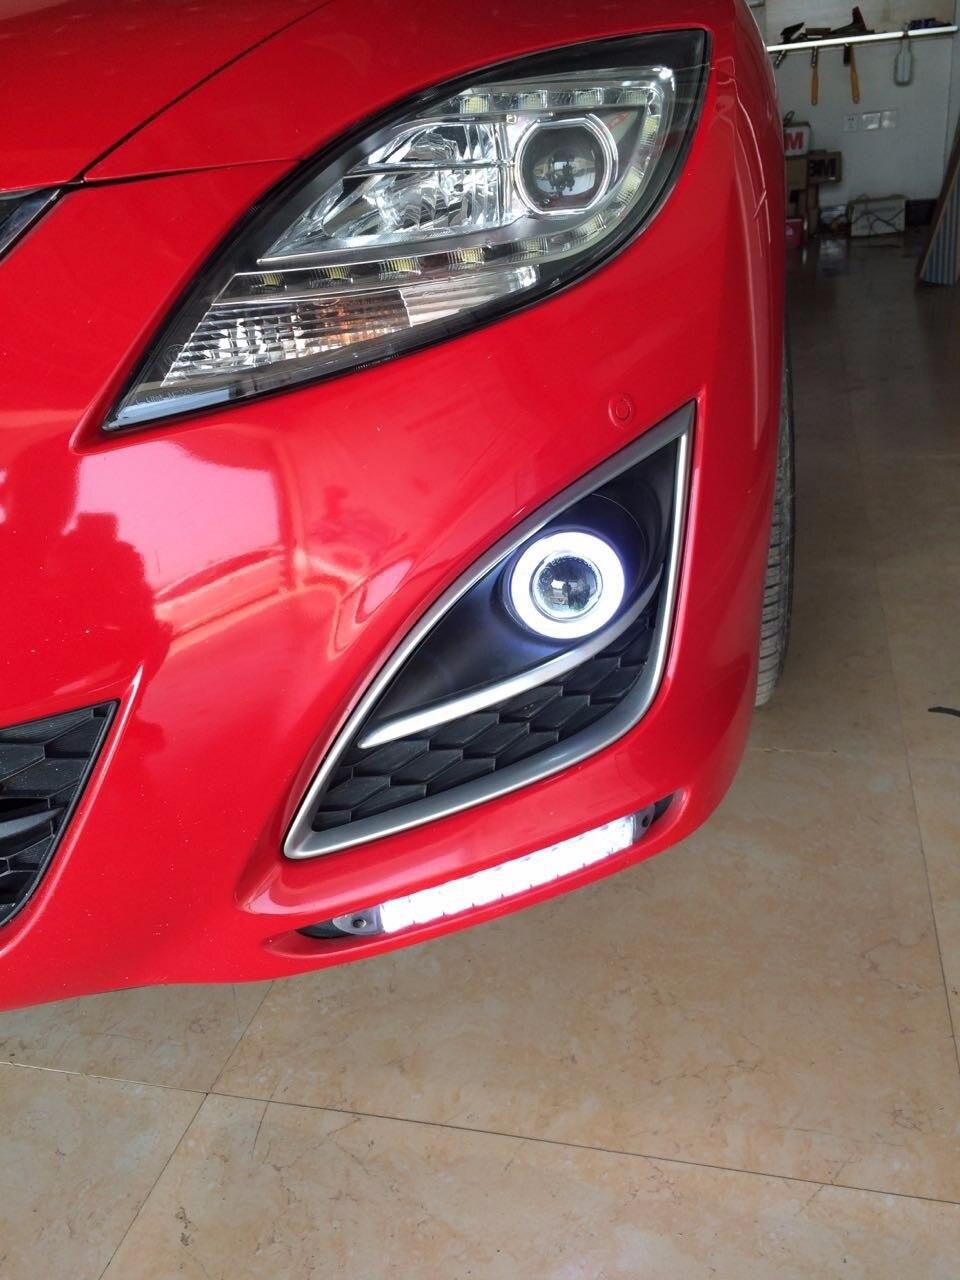 RQXR LED Daytime Running Light For Mazda 6 Atenza 2010-2013 (GH) 2 Generation With Yellow Turn Signal